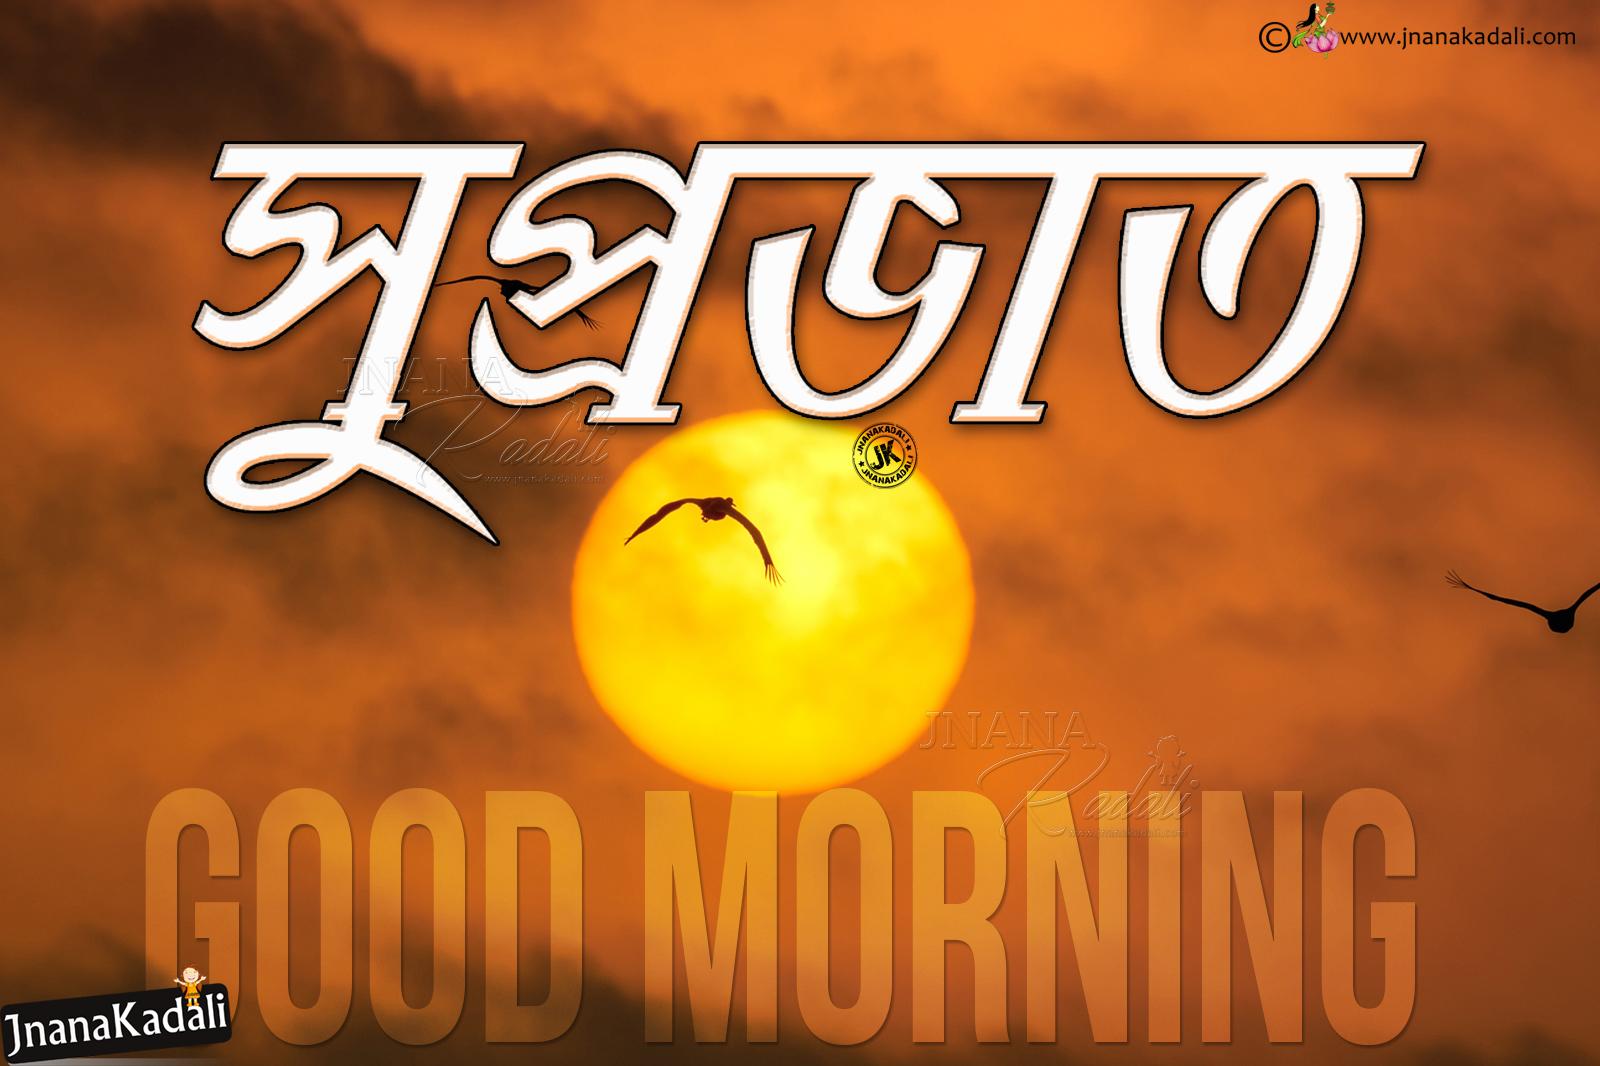 Bengali Latest Good Morning Quotes Hd Wallpaper Suprabath Bengali